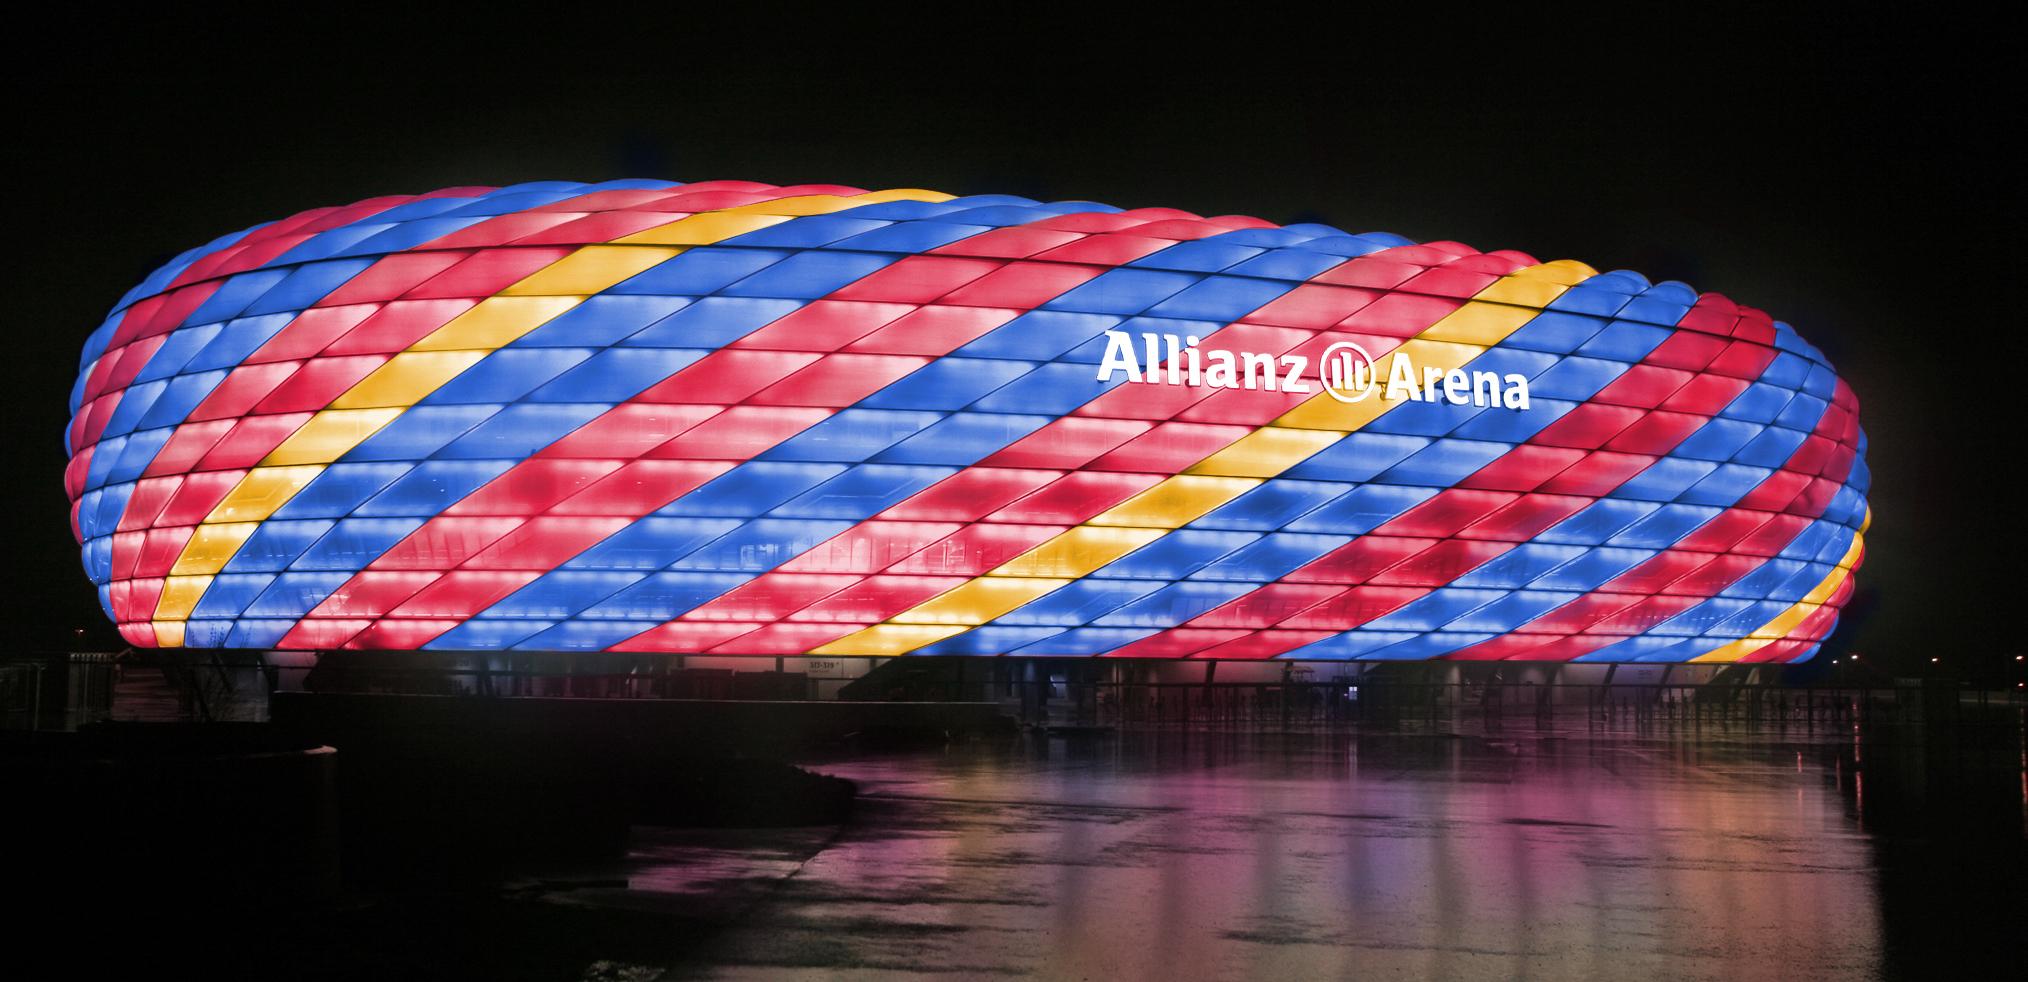 ��� ����� ���� 2020 �������� ������